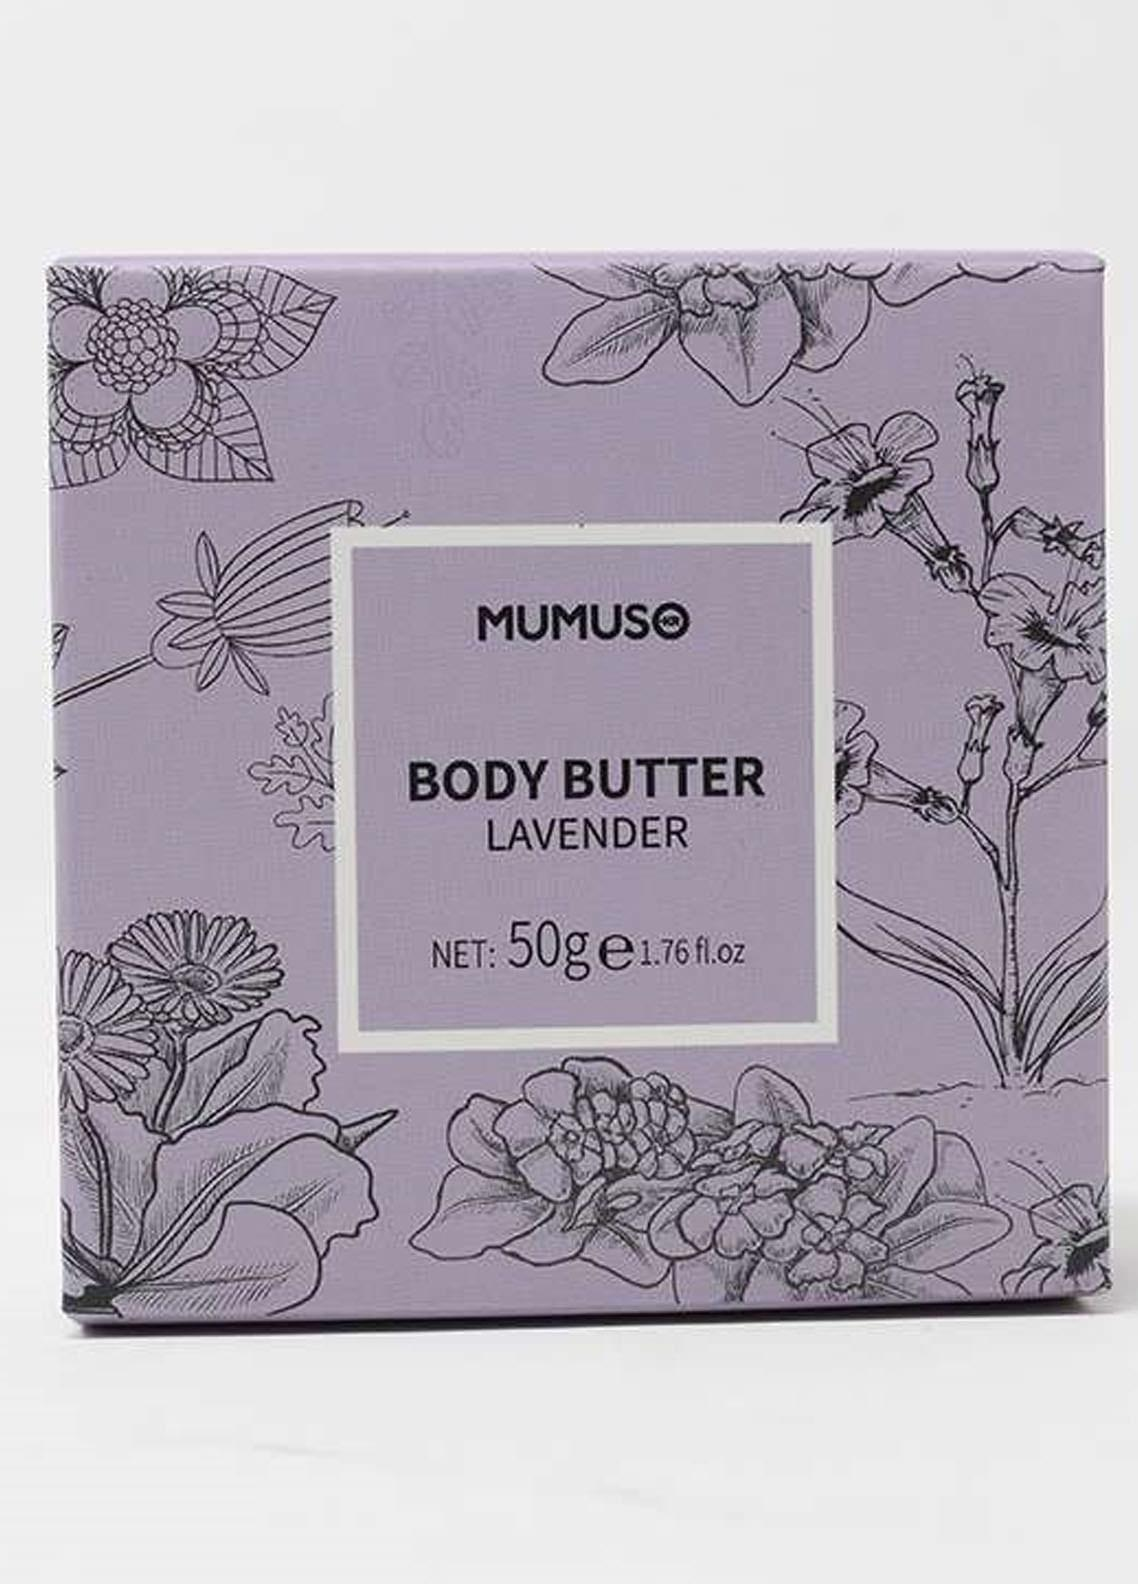 Mumuso Lavender Nourishing Body Butter